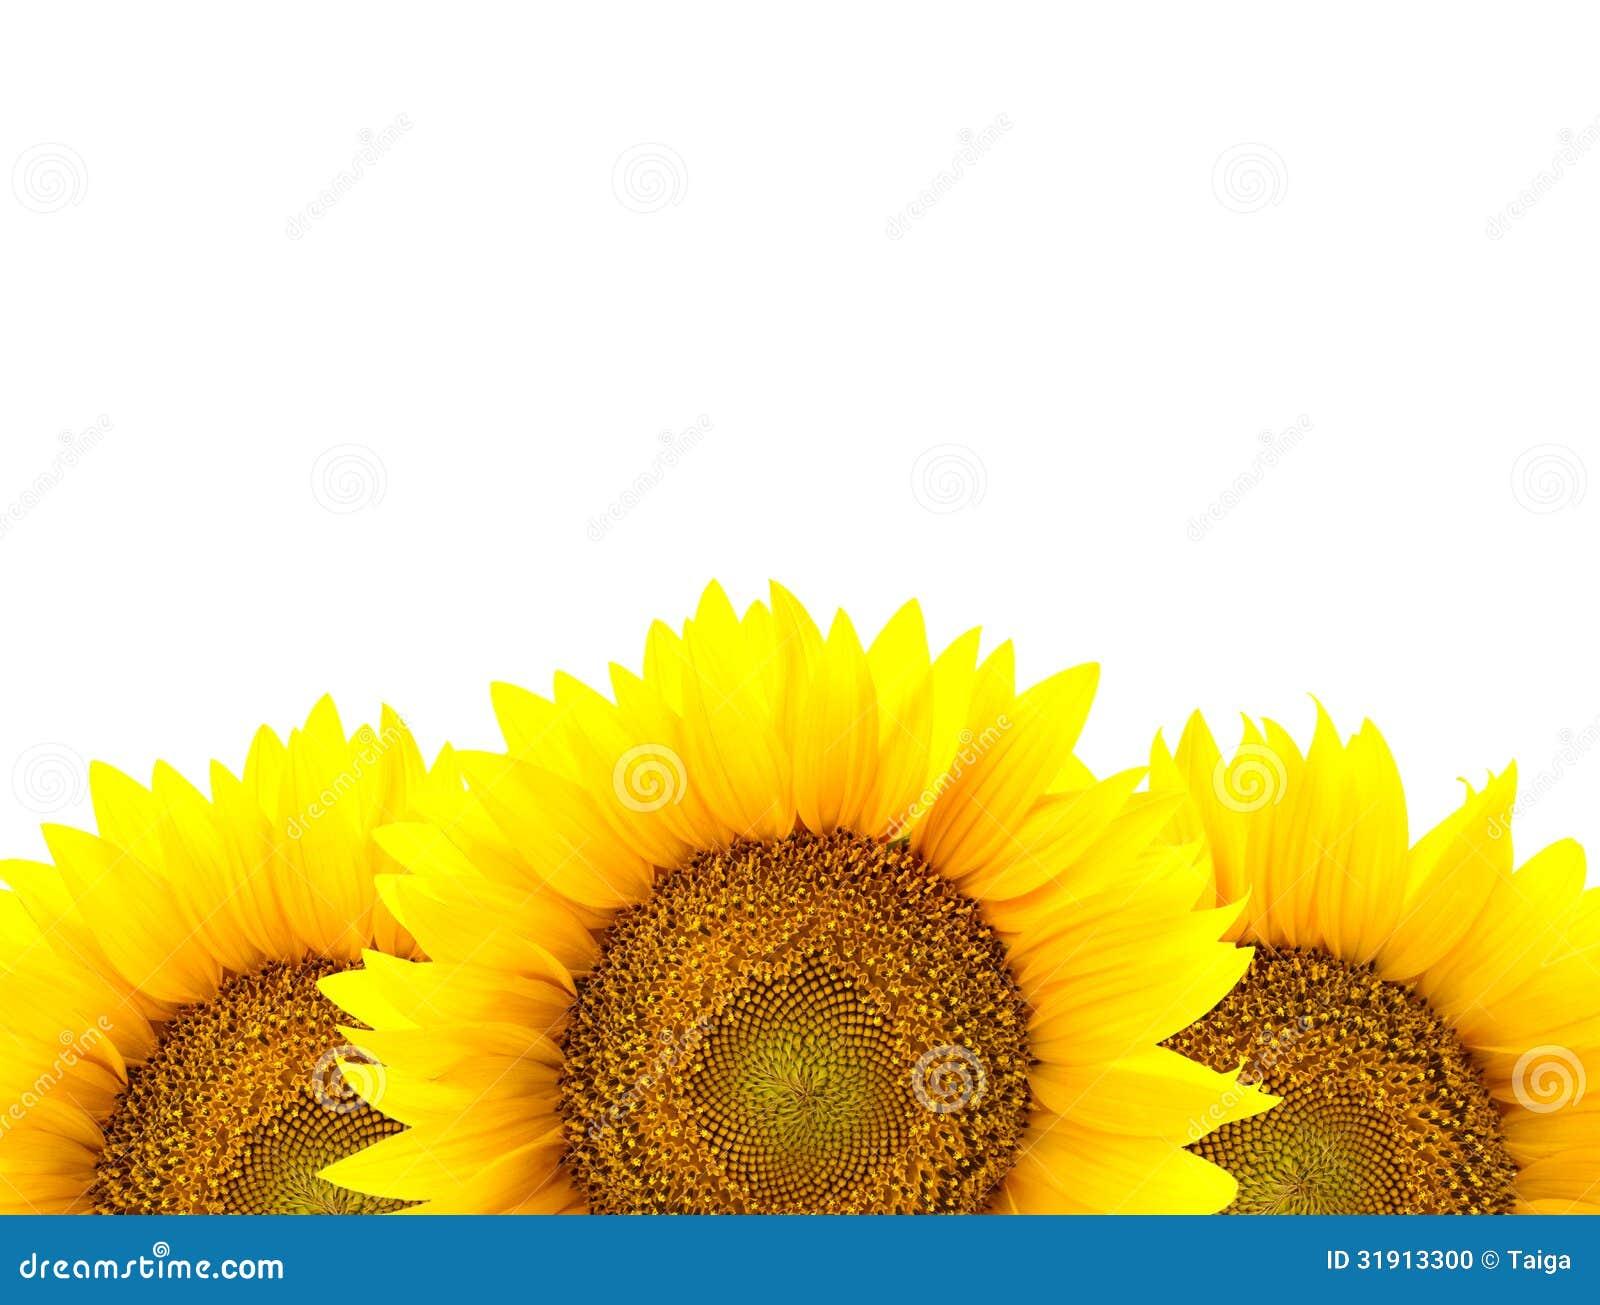 Border Of Large Sunflowers Isolated On White / Flowers ...